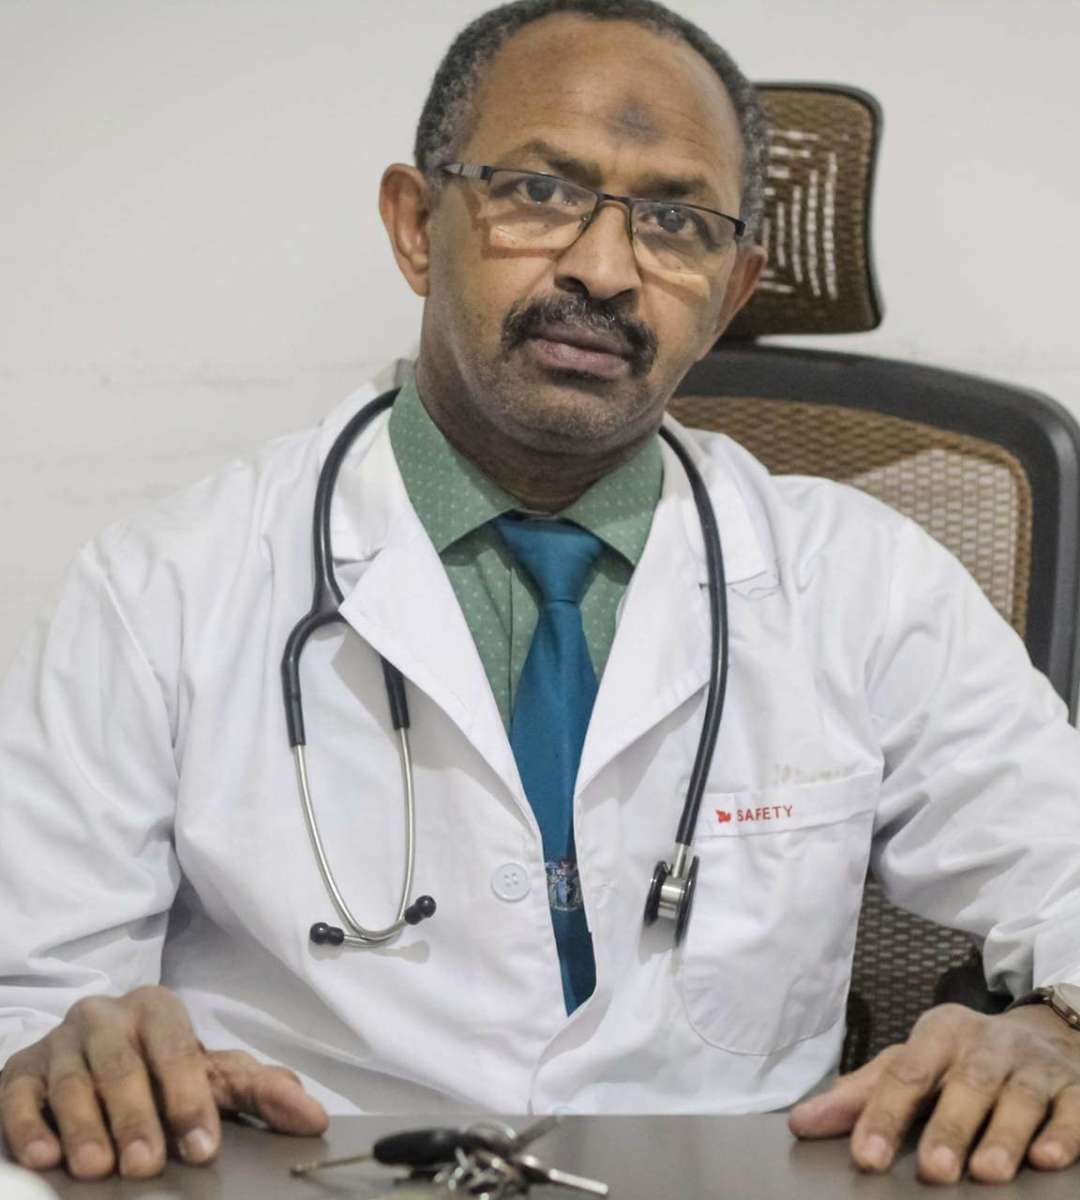 (4) Dr. Mamoun Mahgoub Ahmed